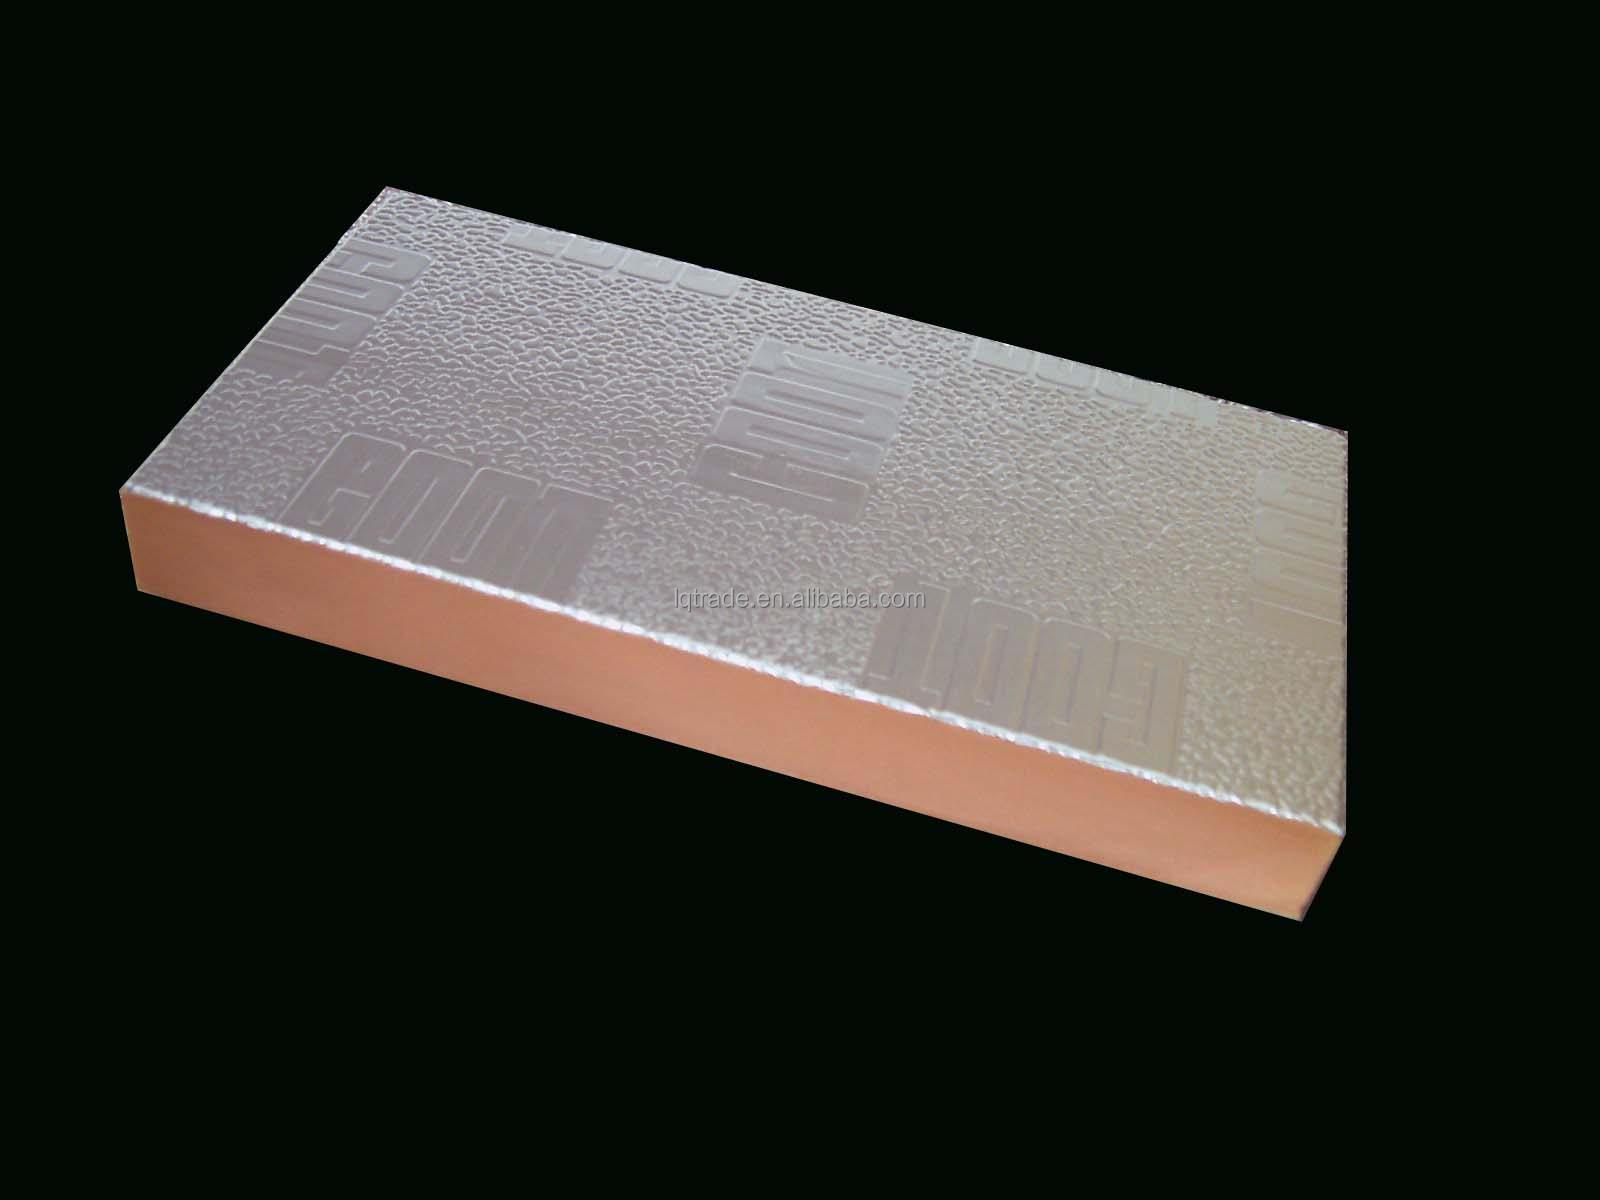 2 Insulation Panels : Two sides aluminum foil phenolic foam insulation board lq